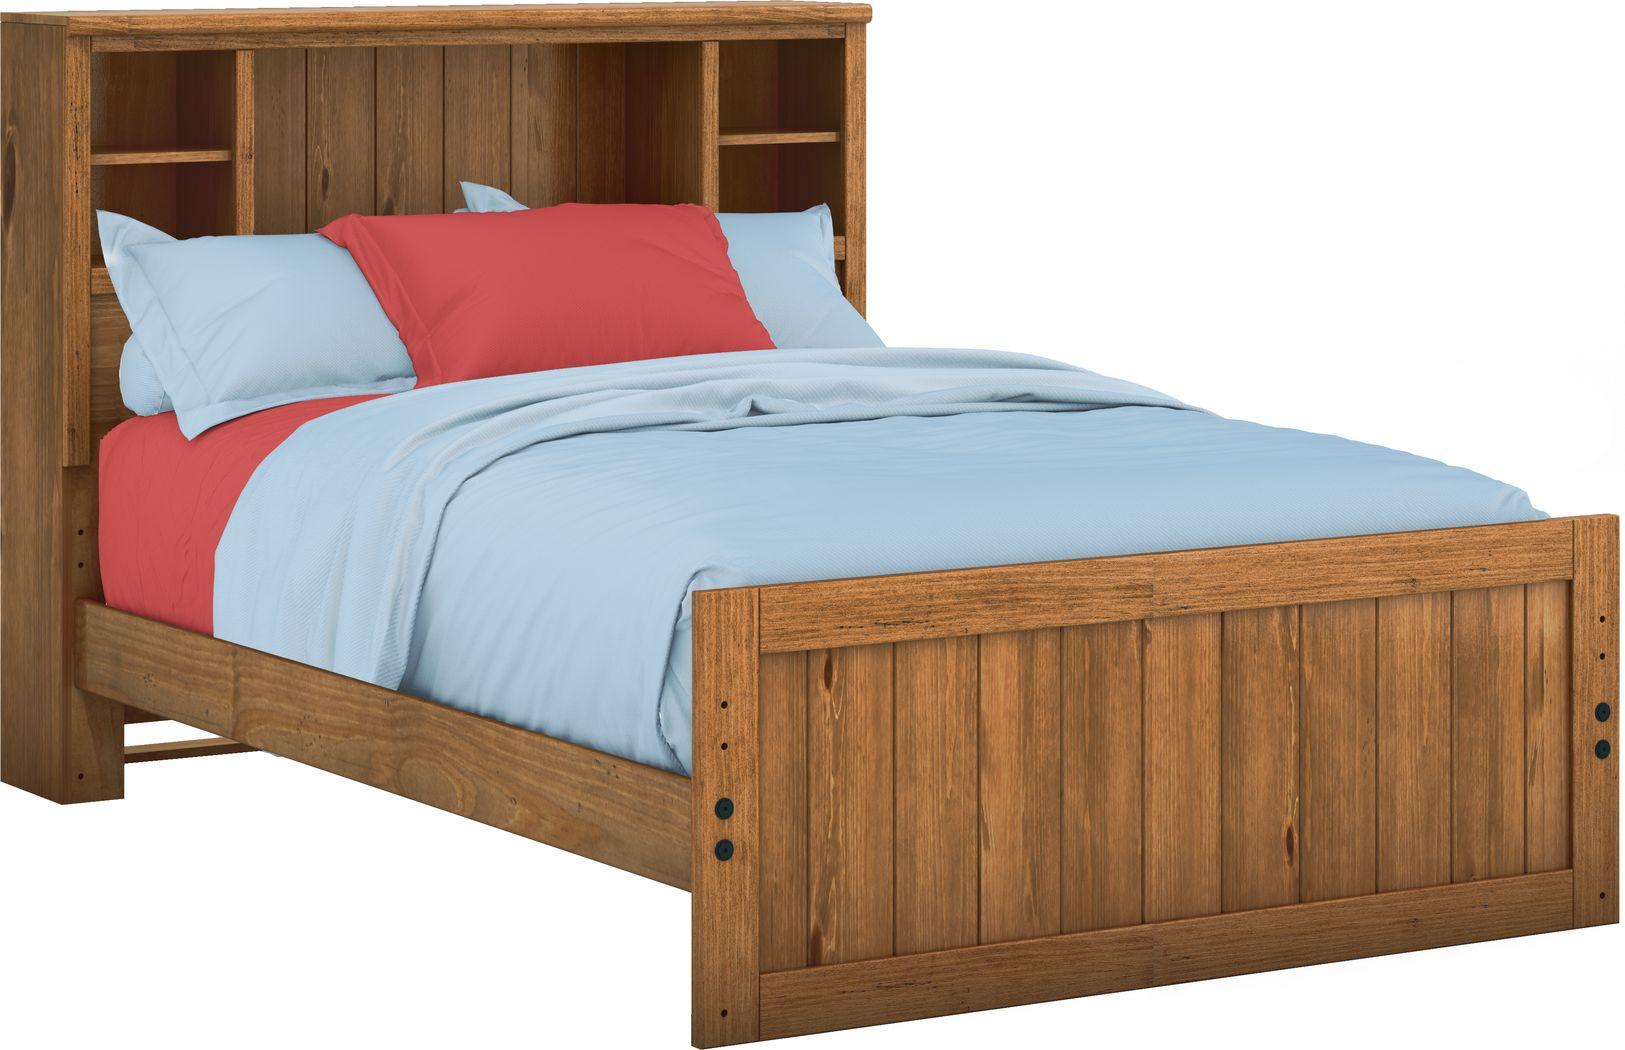 Kids Creekside Chestnut 3 Pc Full Bookcase Bed